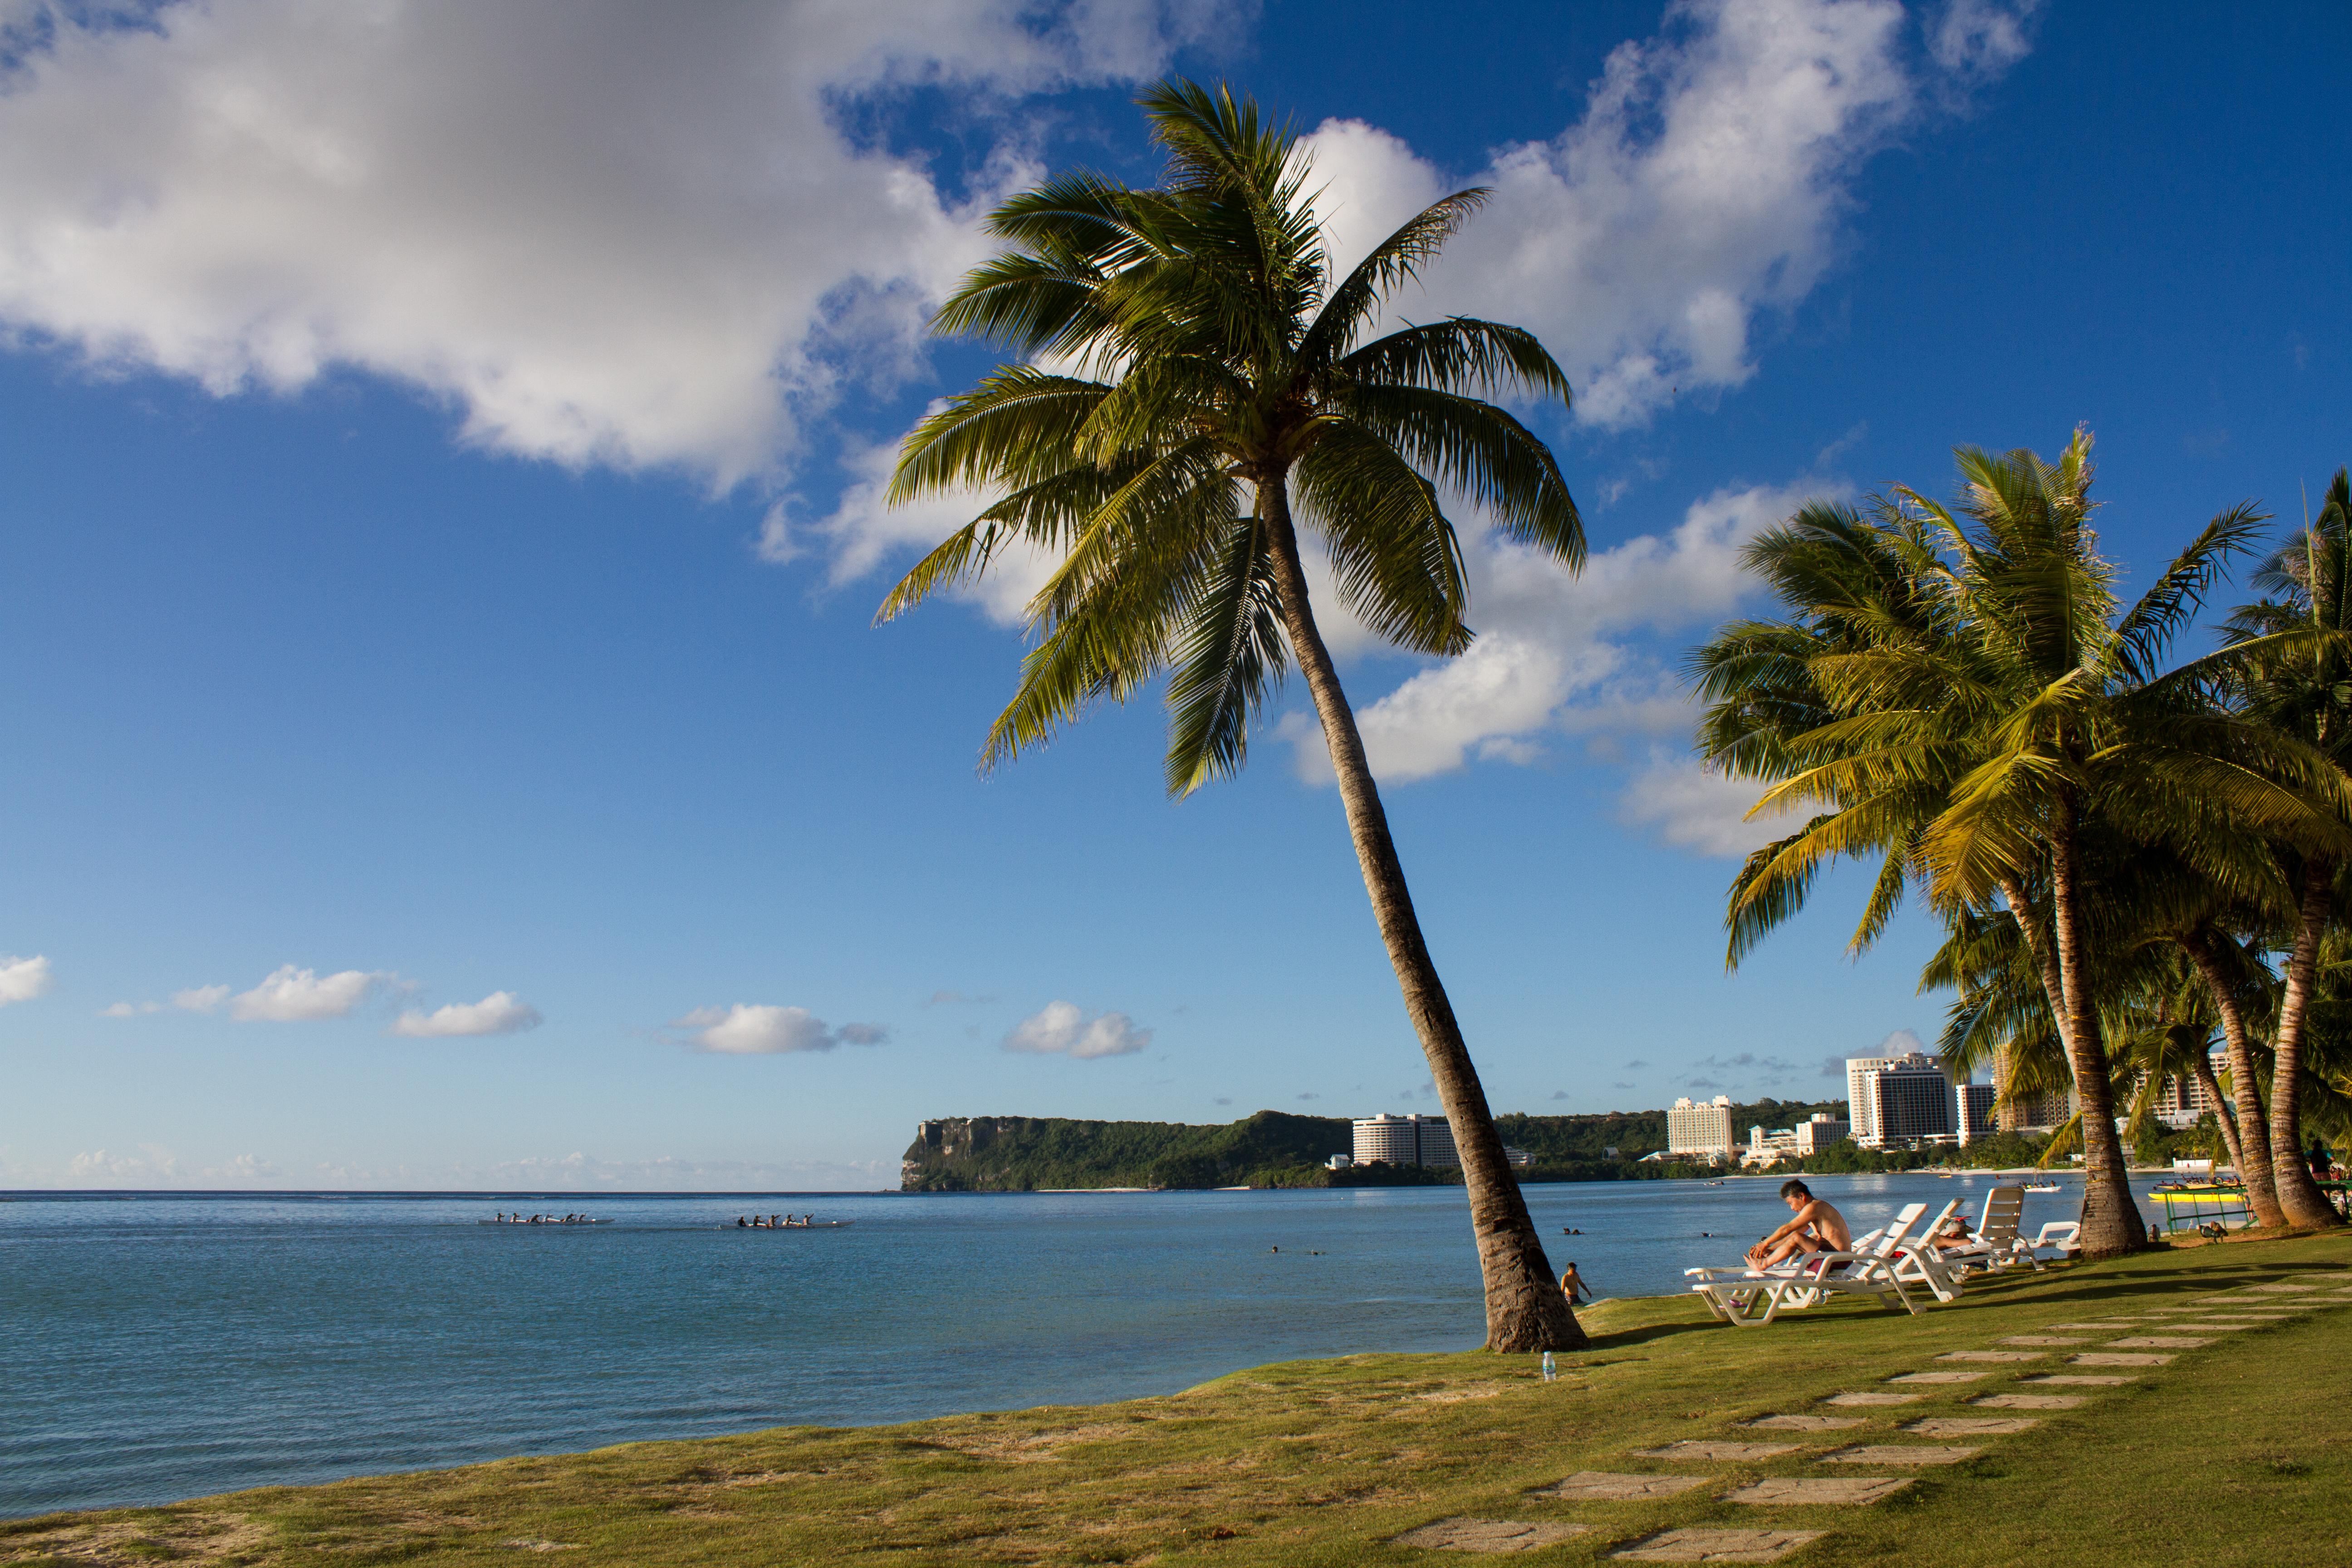 Beach of Fiesta Hotel, Beach, Landscape, Outdoor, Palm tree, HQ Photo